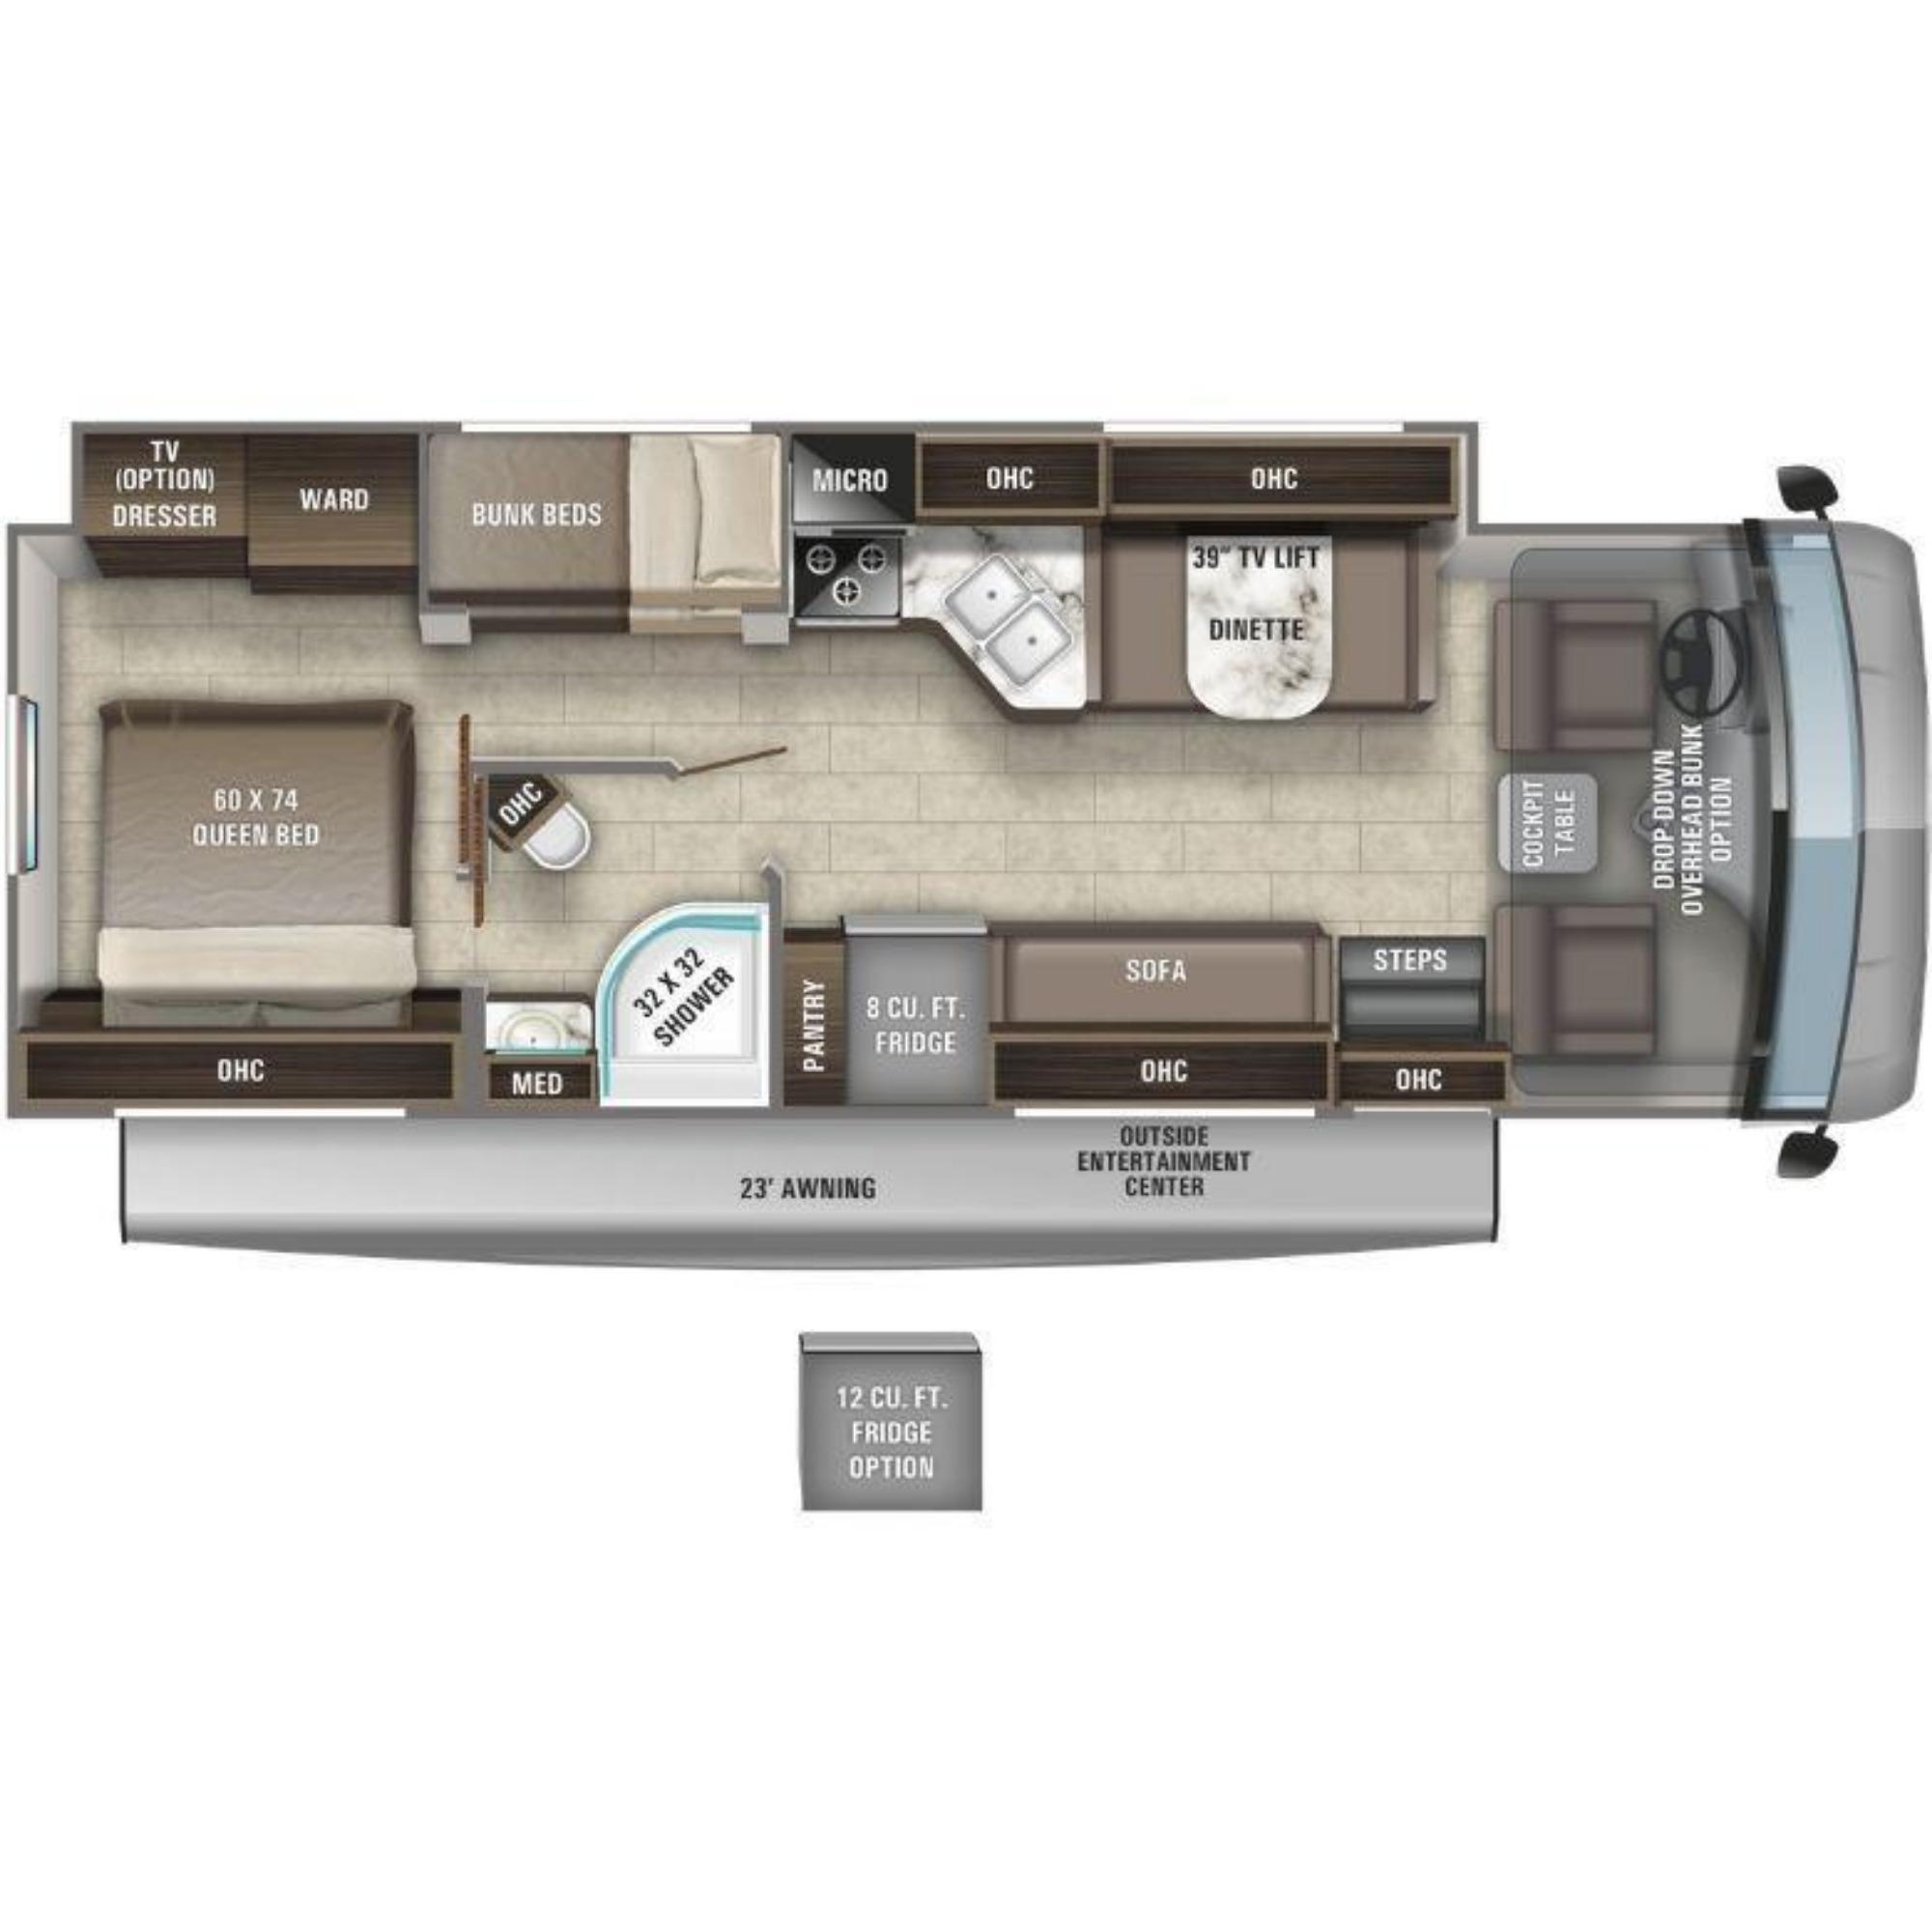 View Floor Plan for 2021 ENTEGRA COACH VISION 29F